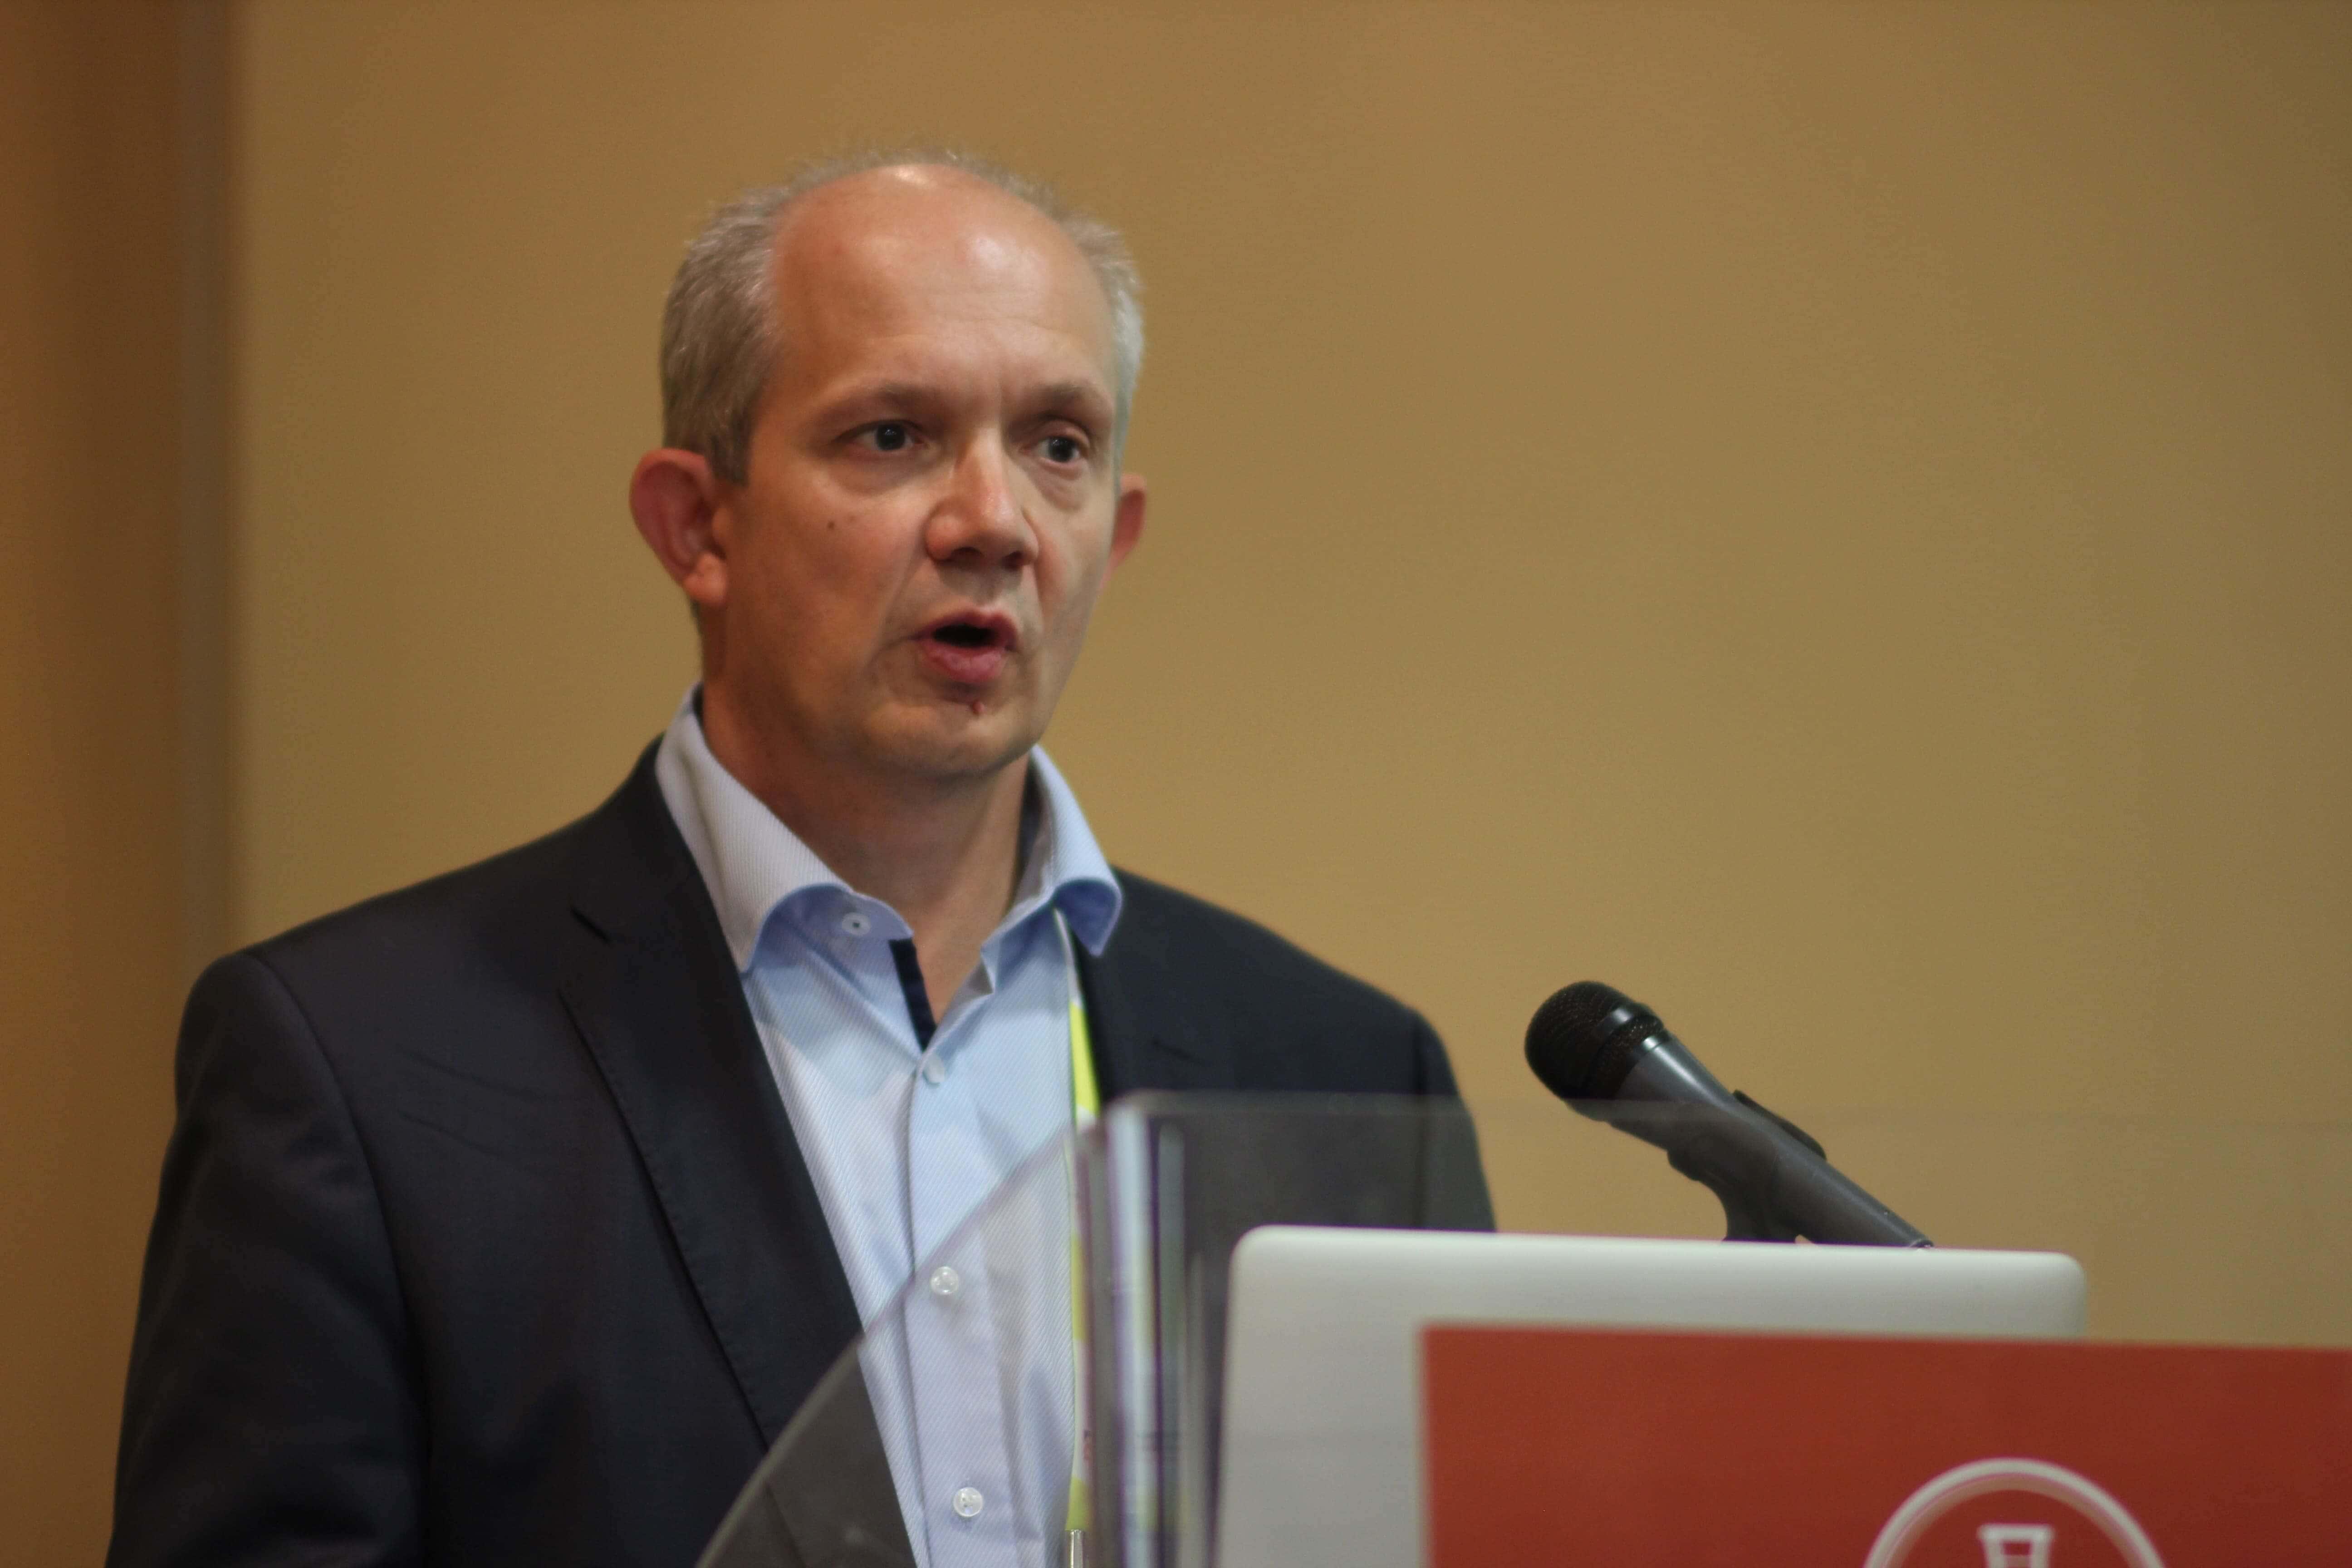 Juha Lehtonen, VTT Technical Research Centre of Finland Ltd, Finland